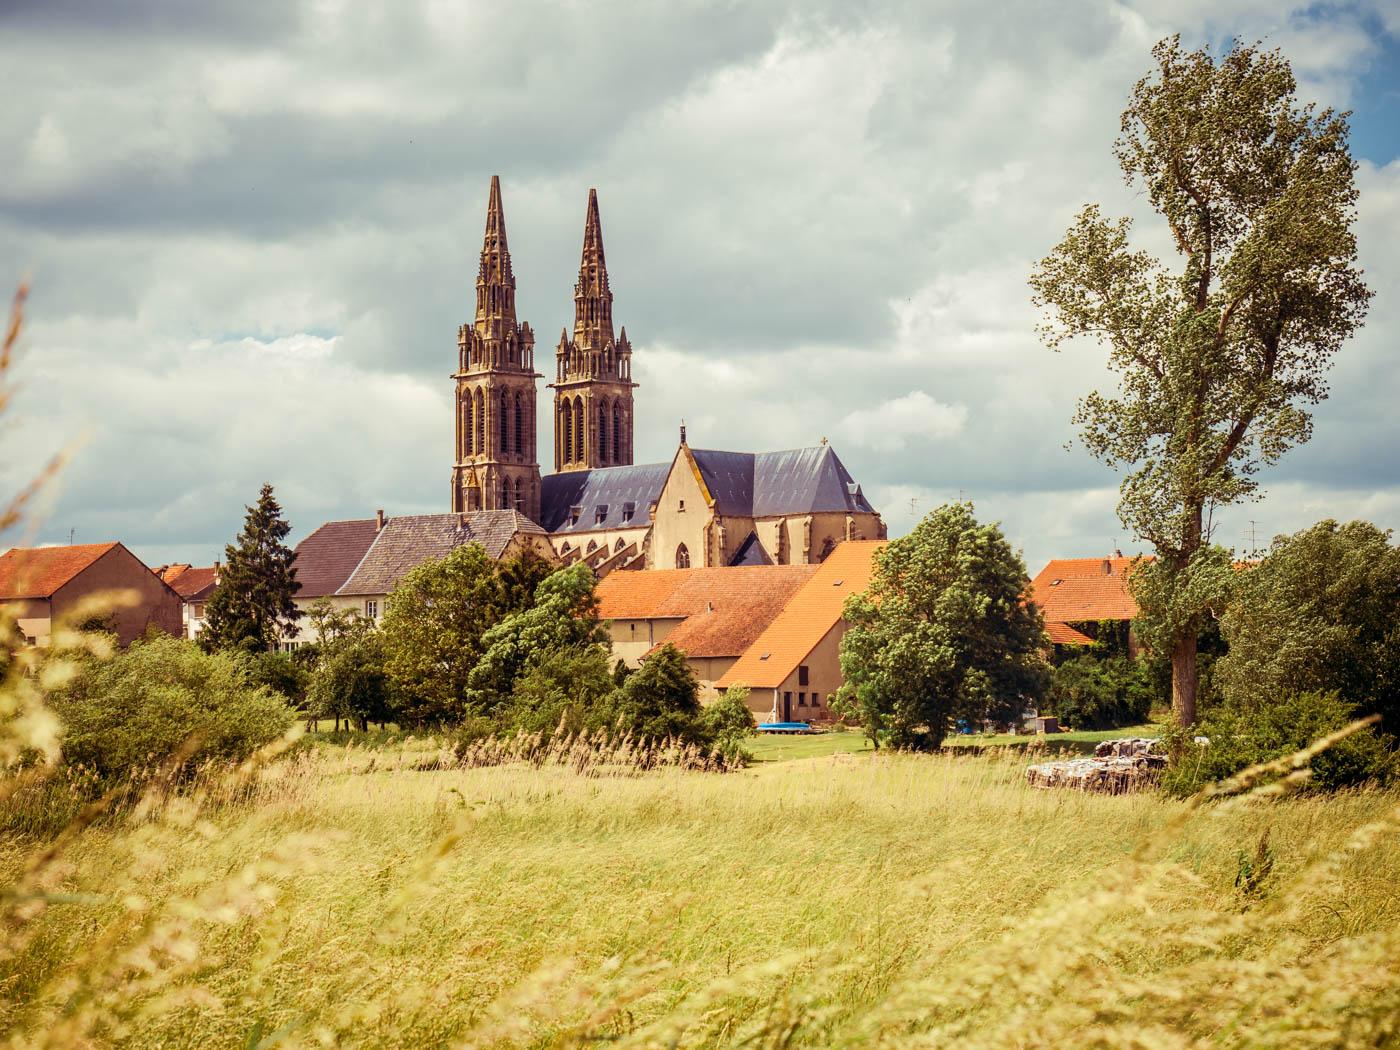 Munster (Moselle)